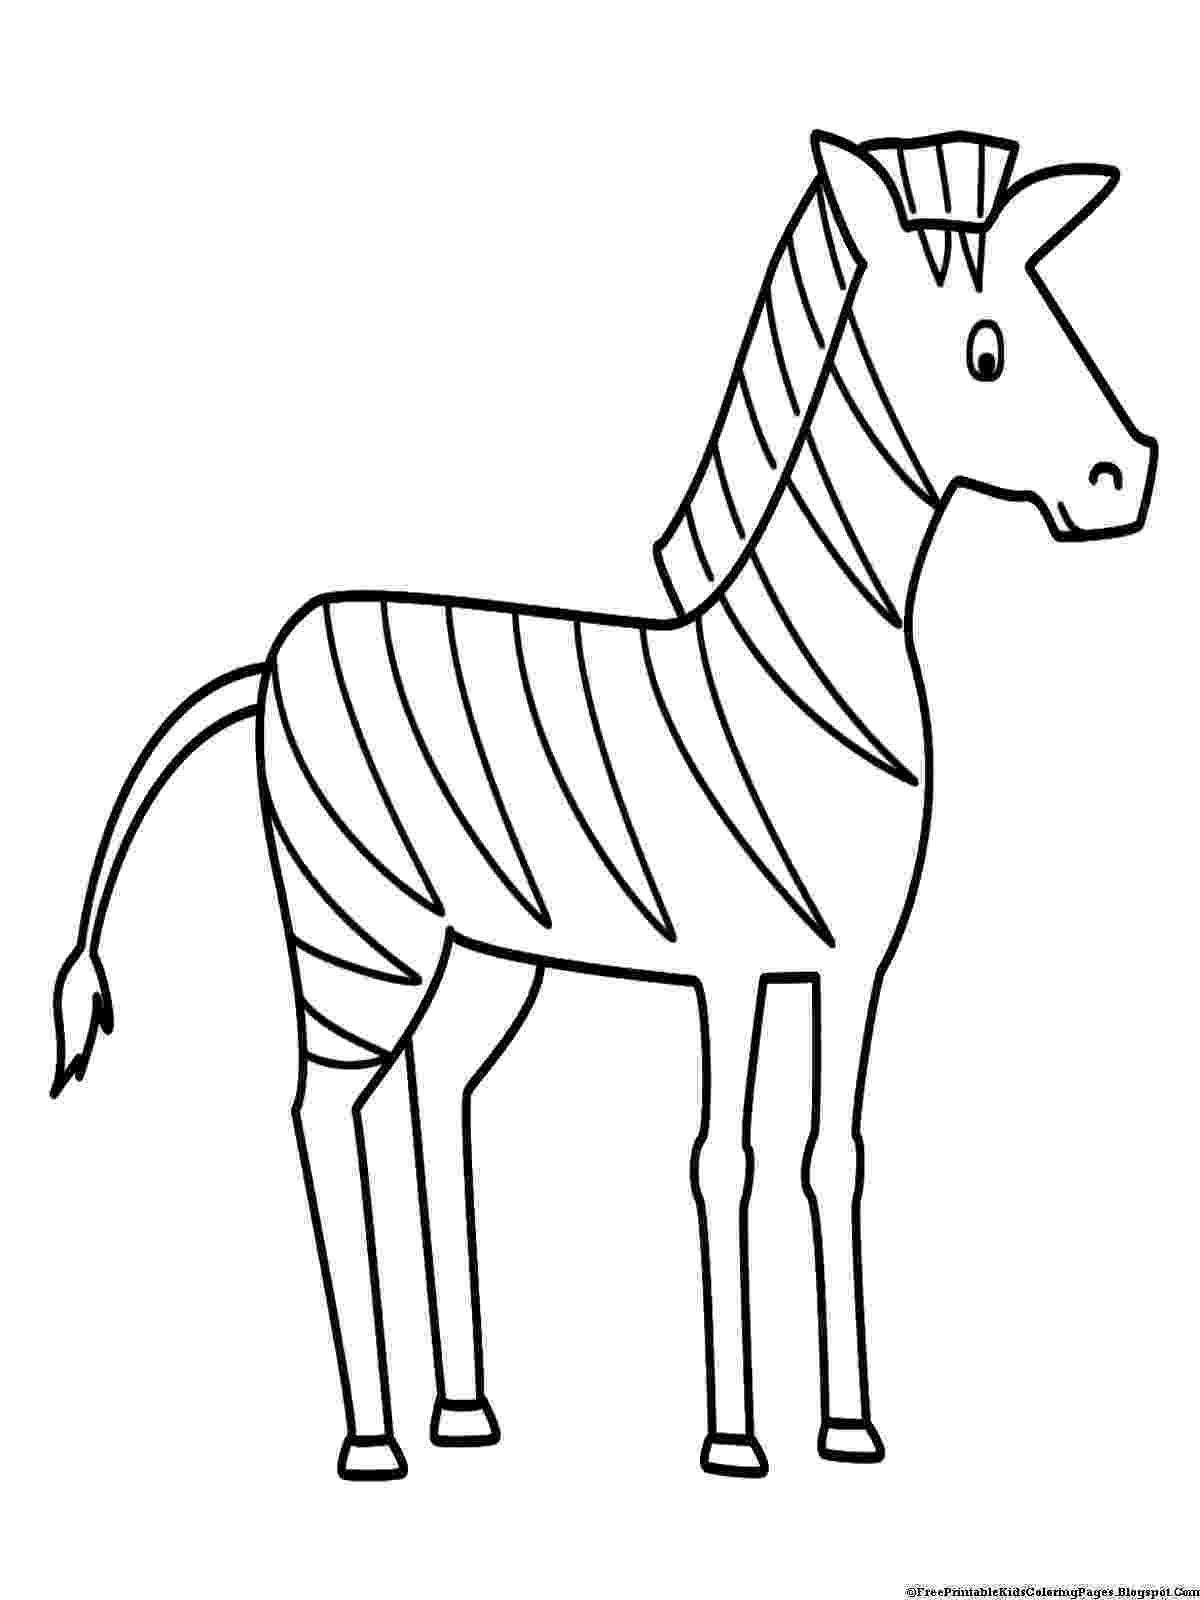 colouring picture of zebra zebra coloring pages download and print zebra coloring pages zebra picture of colouring